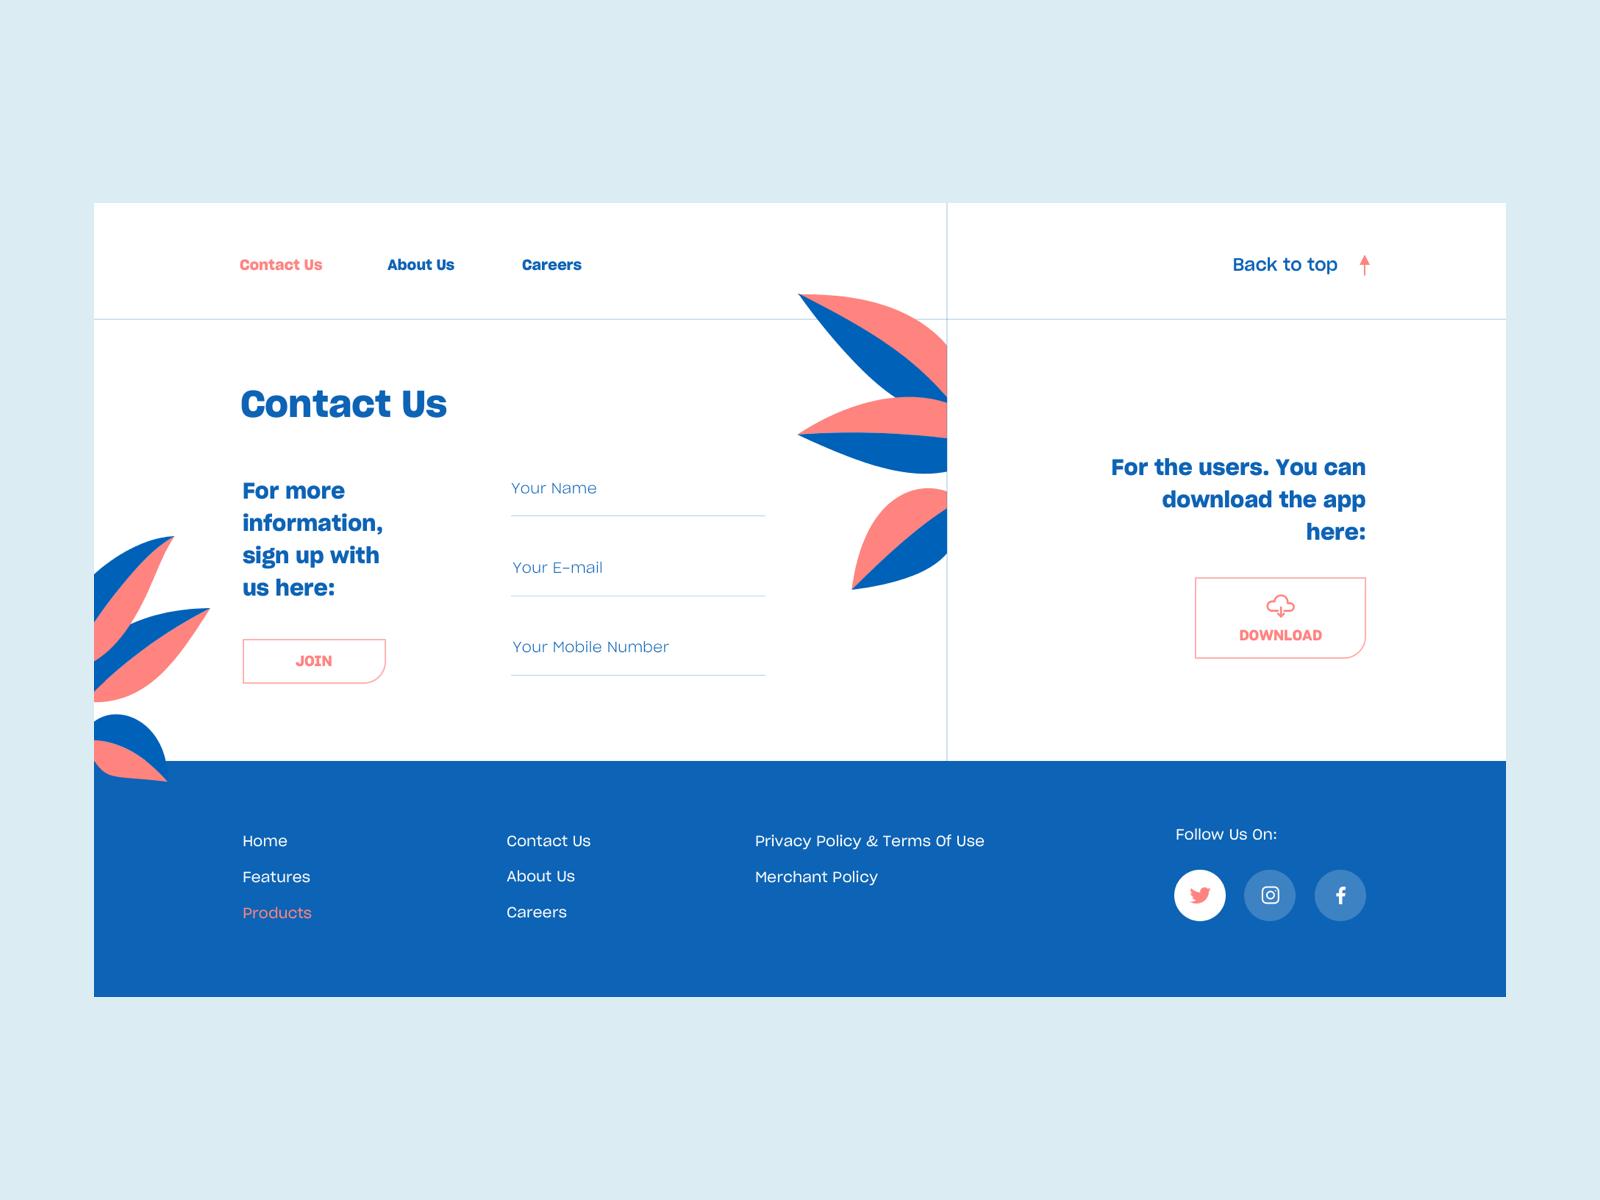 Contact Us Simple Web Design Web Design Contact Us Page Design